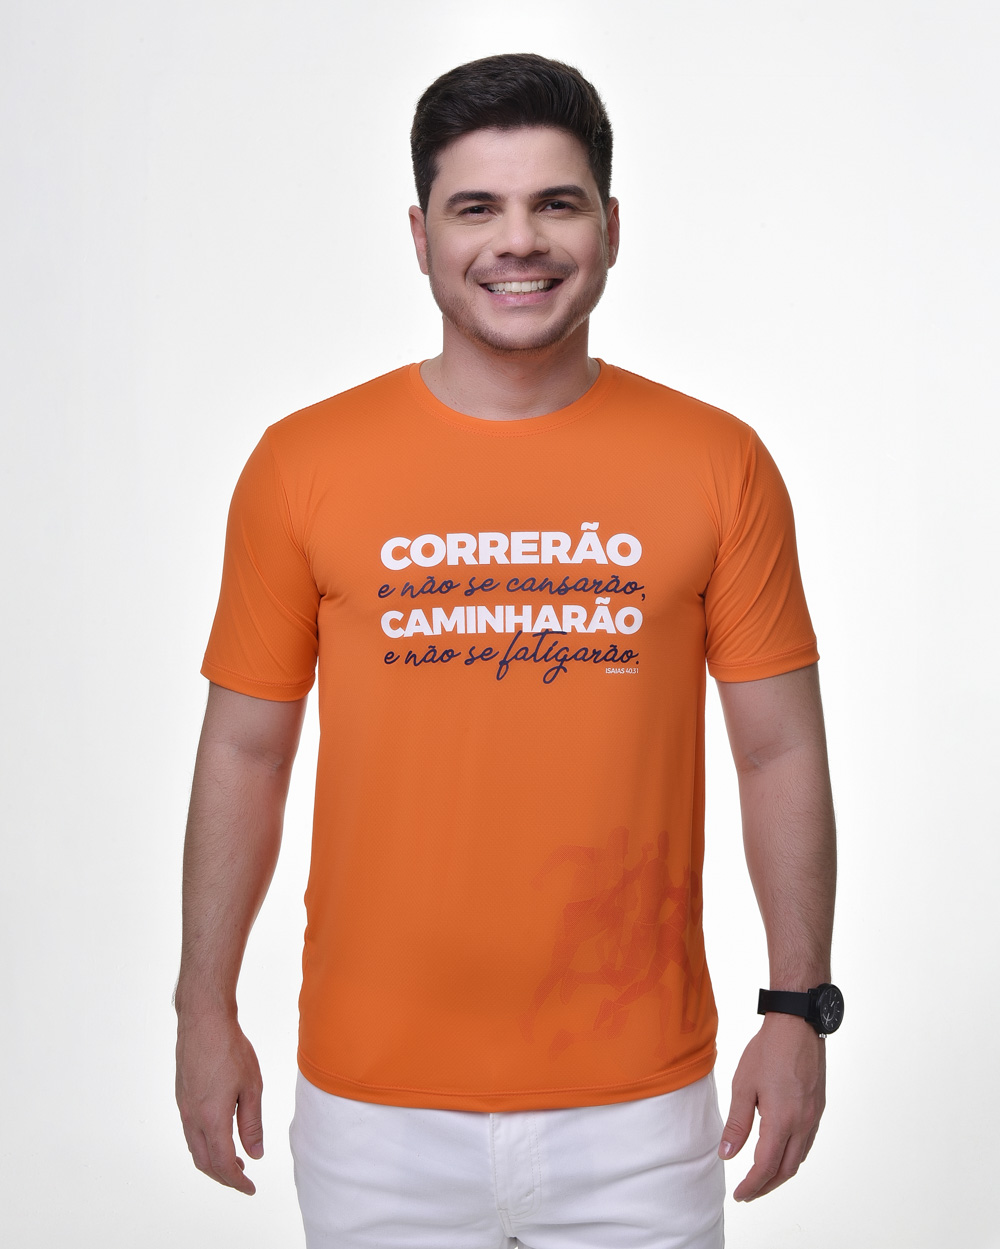 Camiseta Fitness Tradicional - Bendito Treino 01